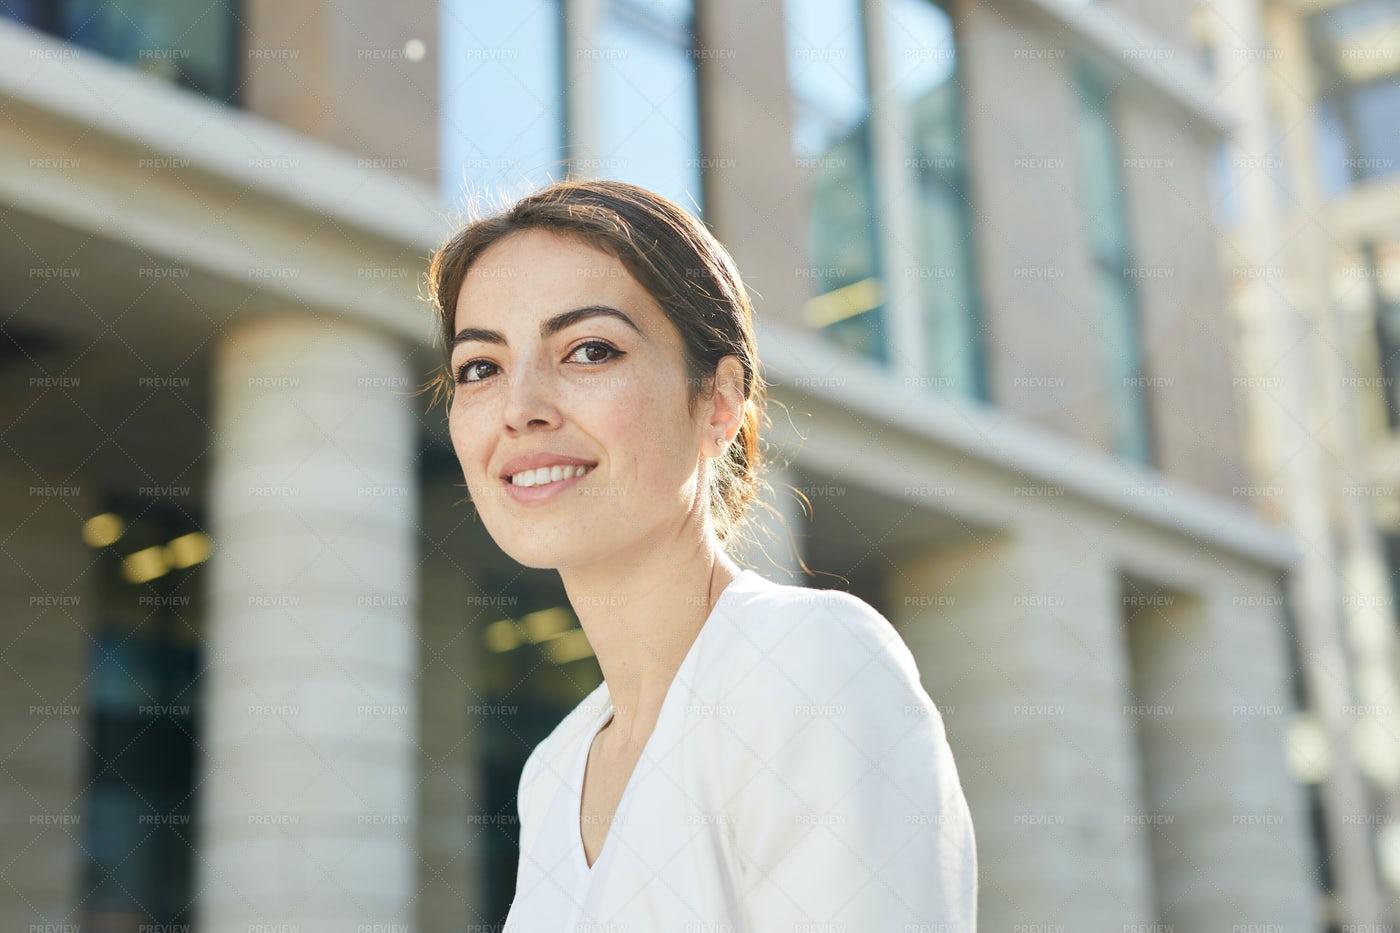 Portrait Of Businesswoman Outdoors: Stock Photos